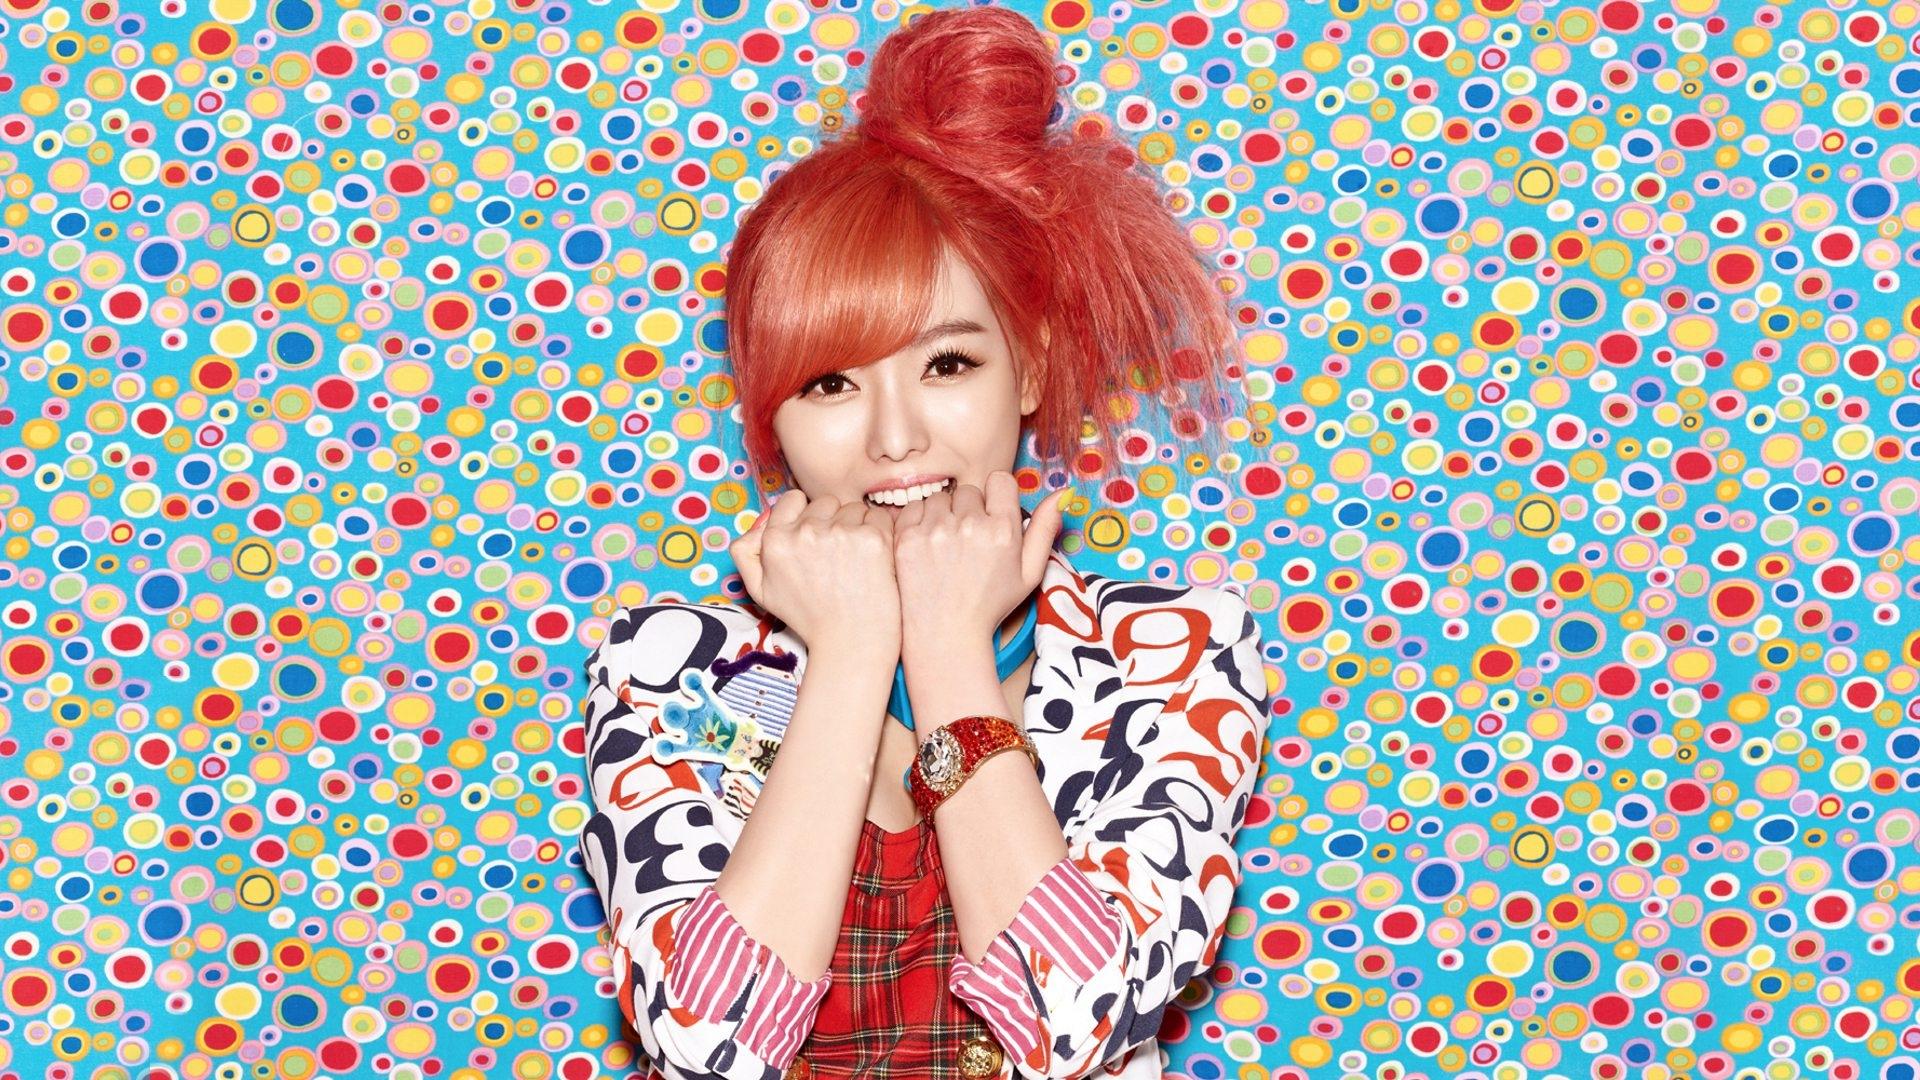 Wallpaper Girl Downlowd Hd Kpop Wallpapers Pixelstalk Net